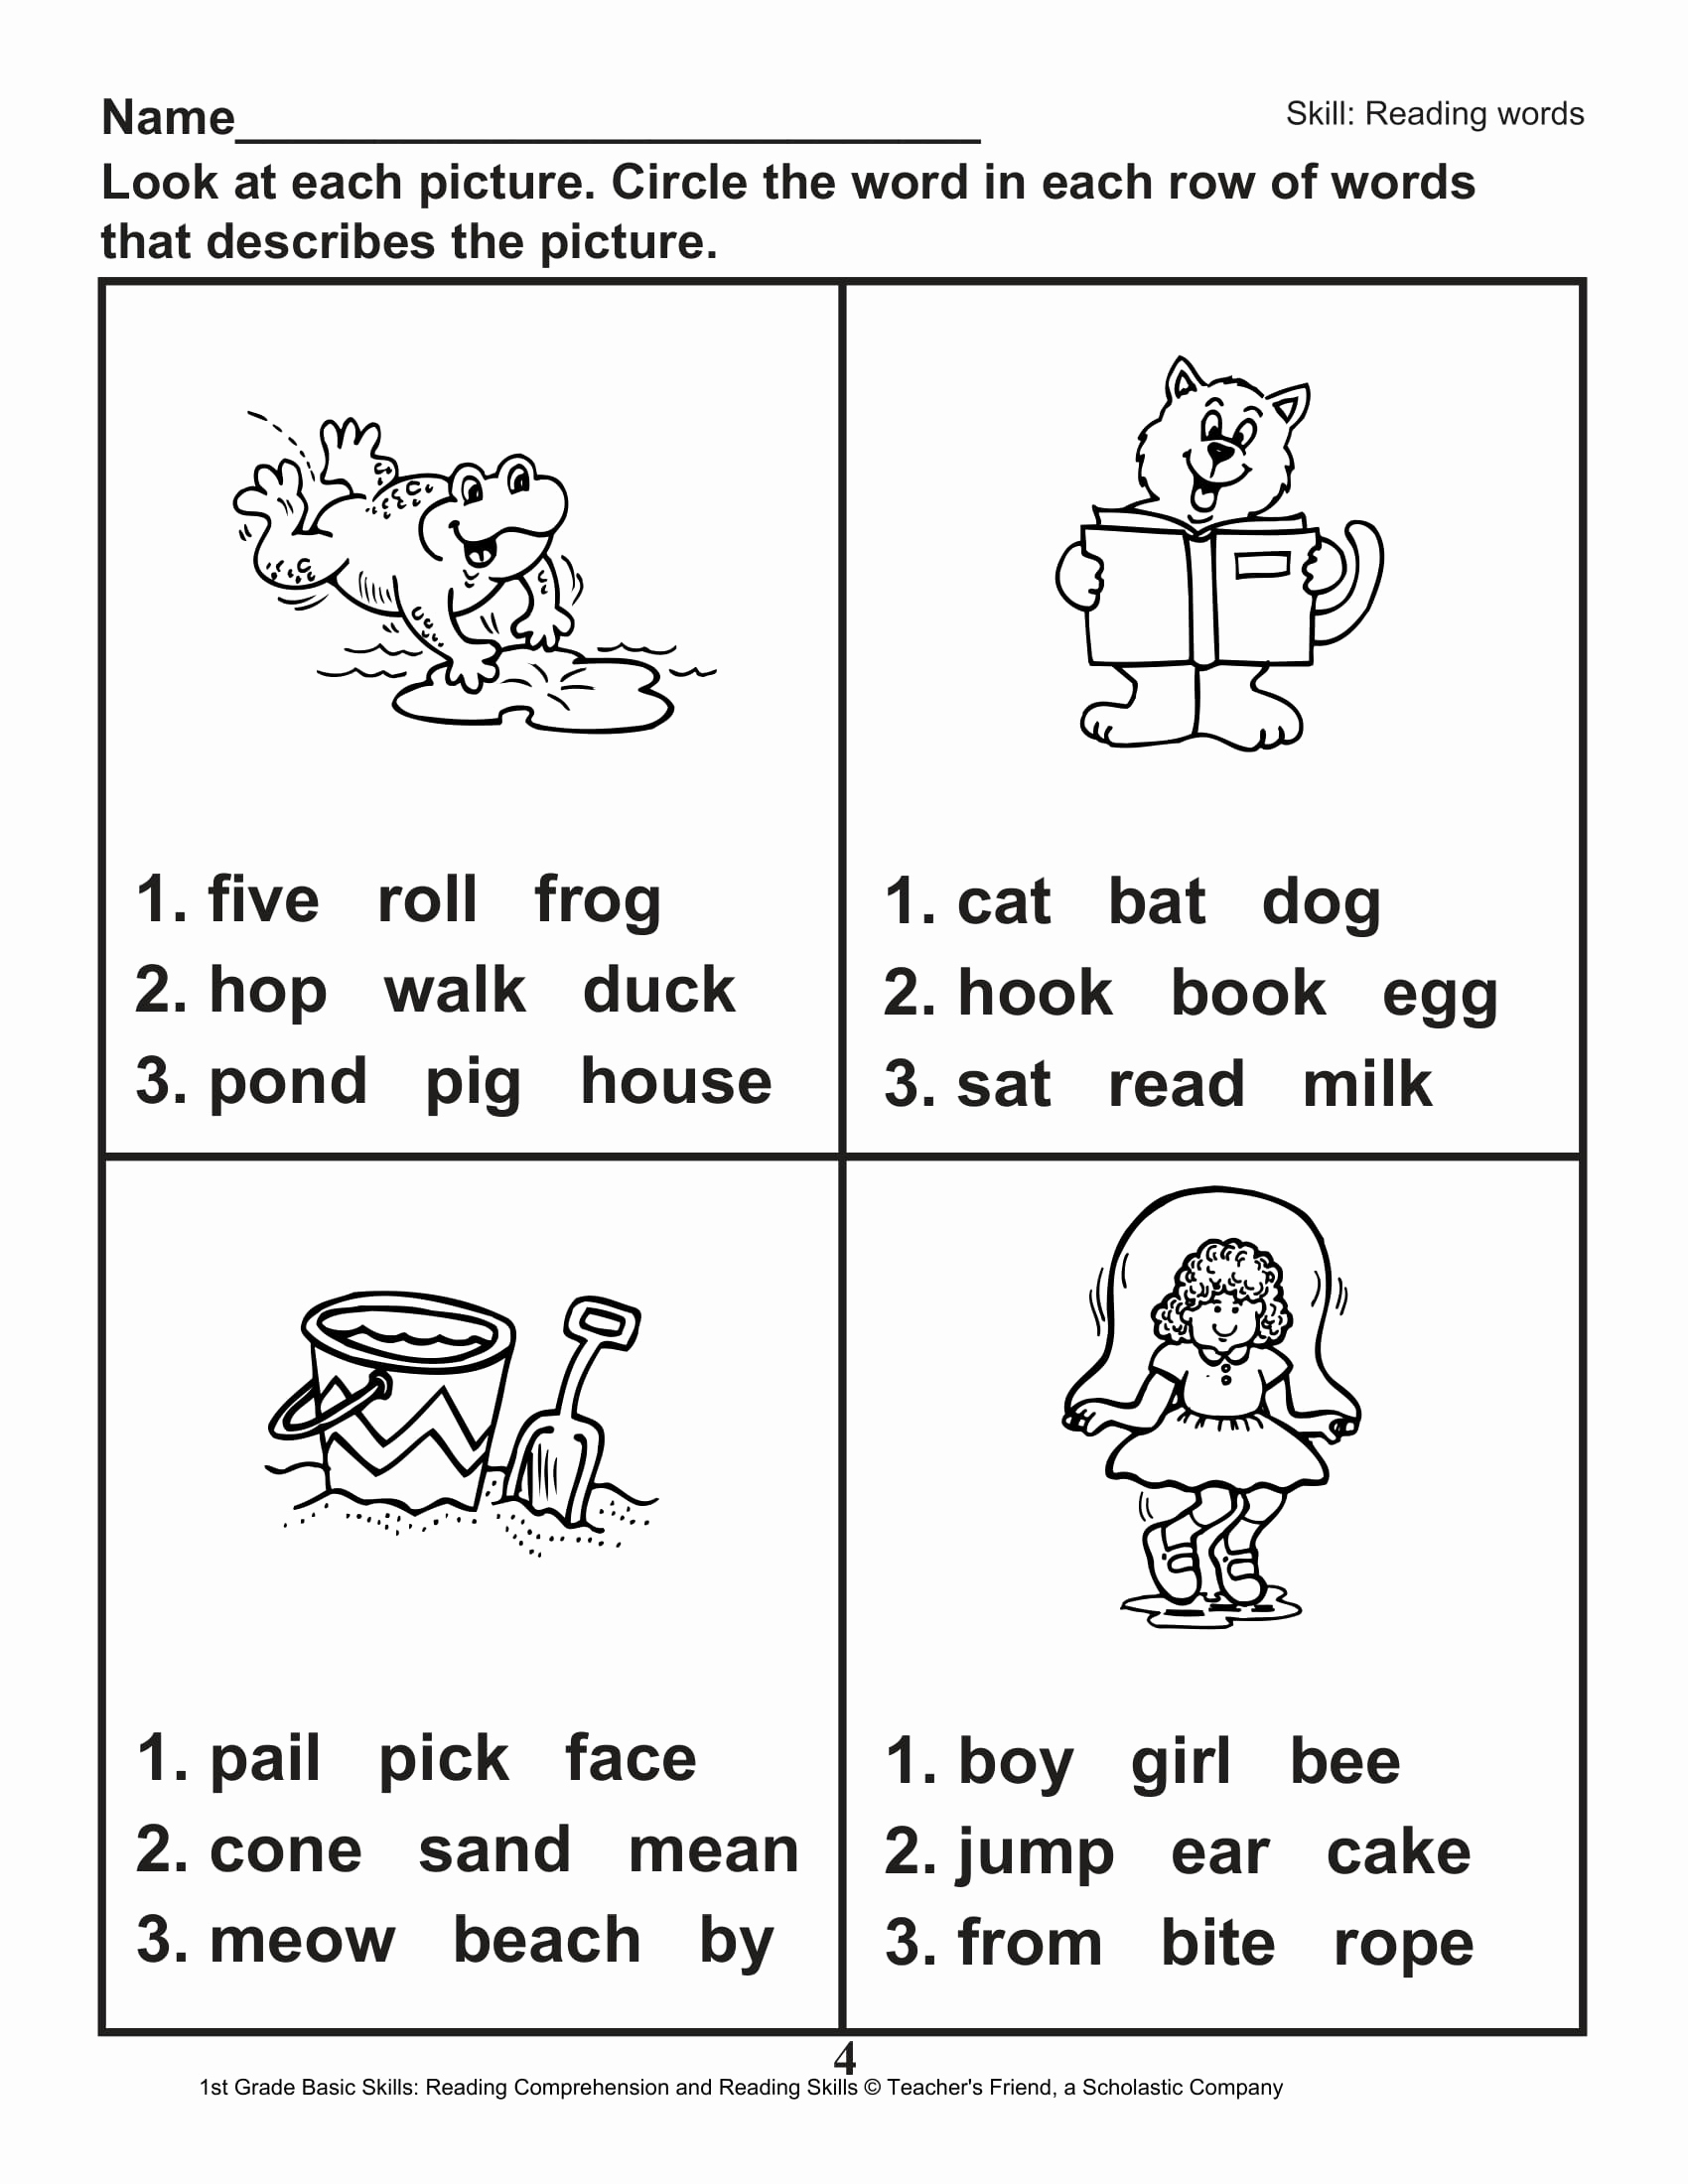 1st Grade Reading Worksheets Printable Inspirational 40 Scholastic 1st Grade Reading Prehension Skills